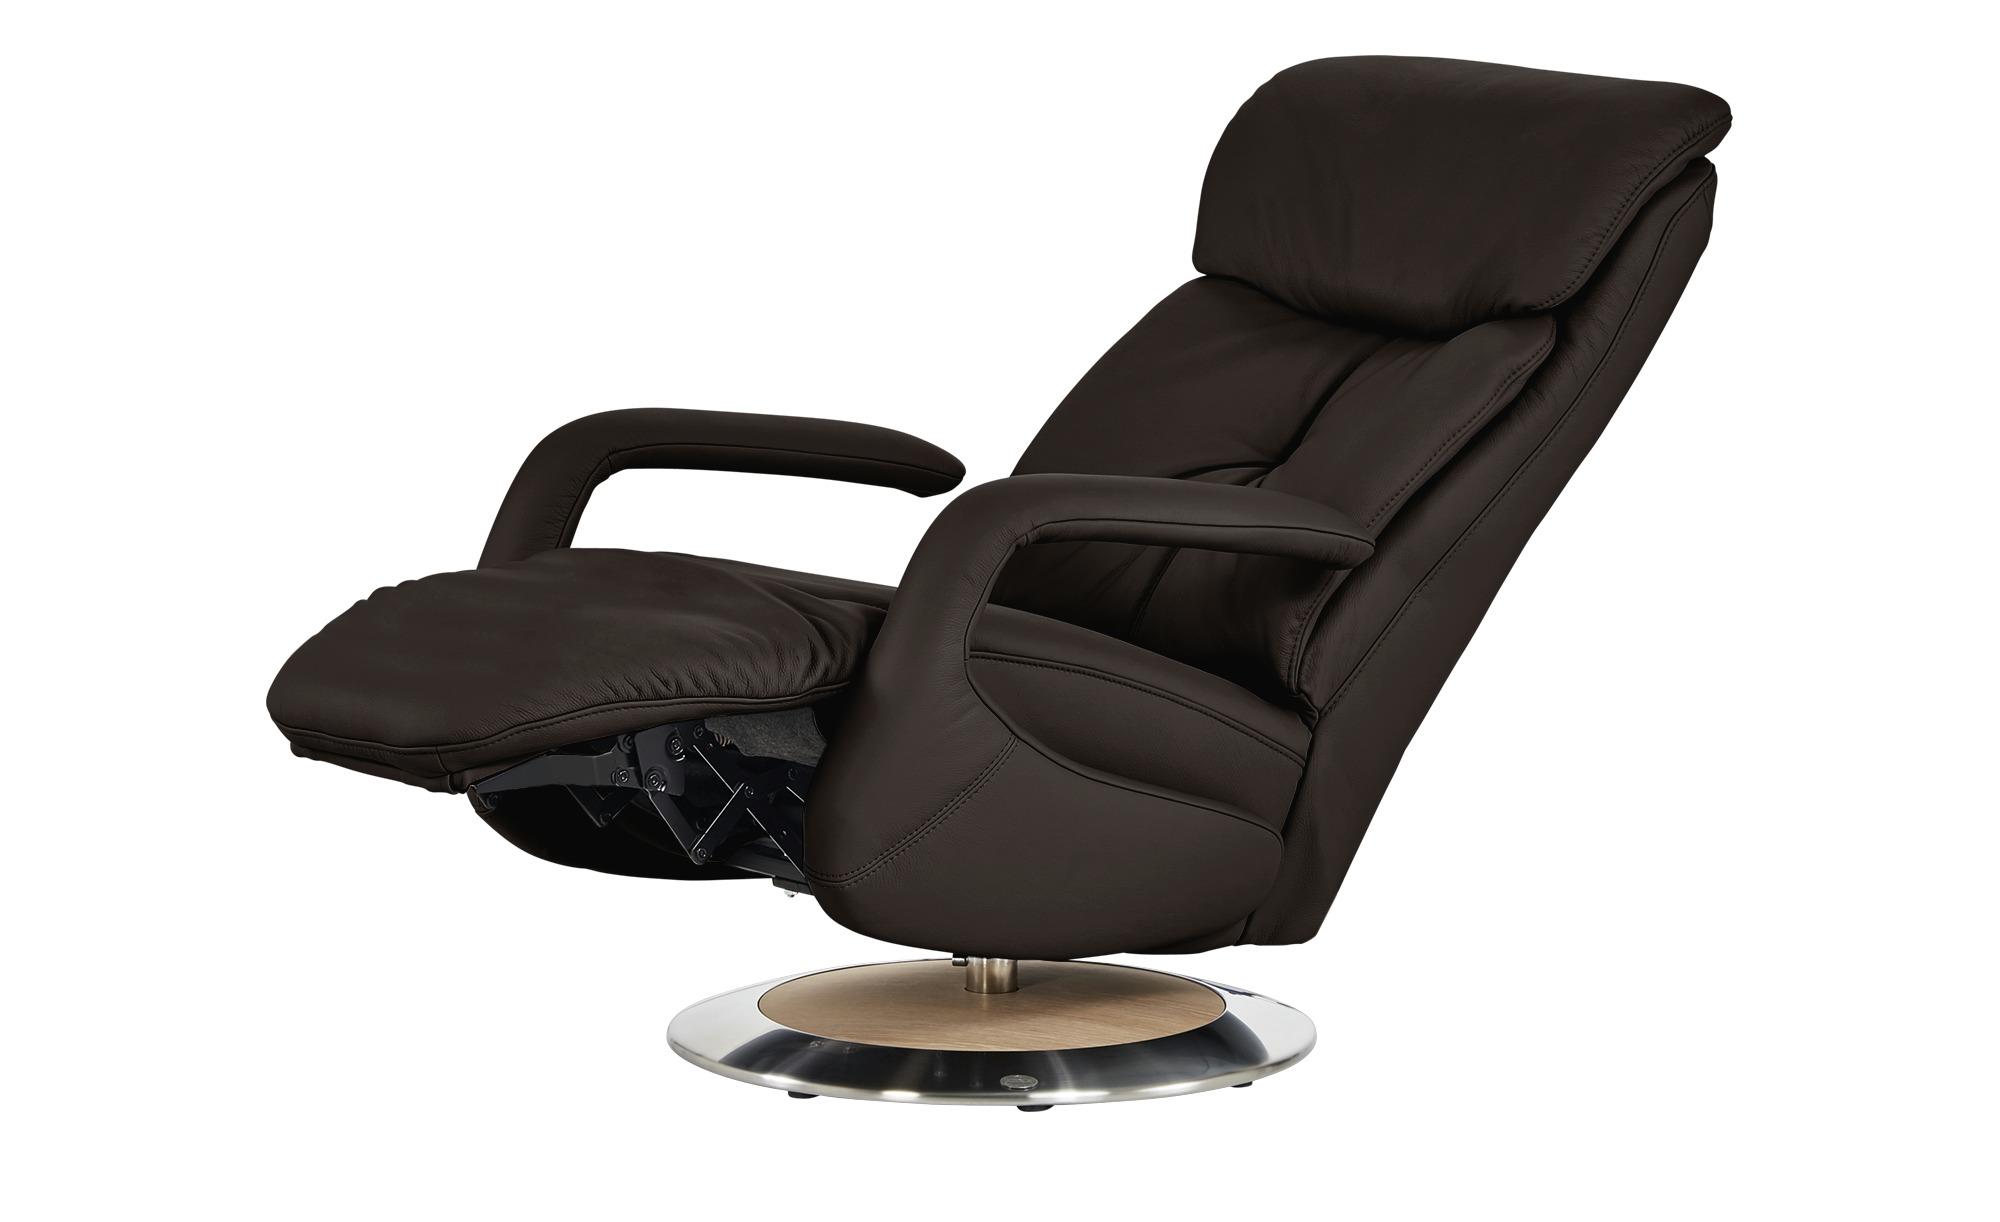 himolla Relaxsessel braun - Leder 7242 ¦ braun ¦ Maße (cm): B: 70 H: 111 T: 88 Polstermöbel > Sessel > Fernsehsessel - Höffner